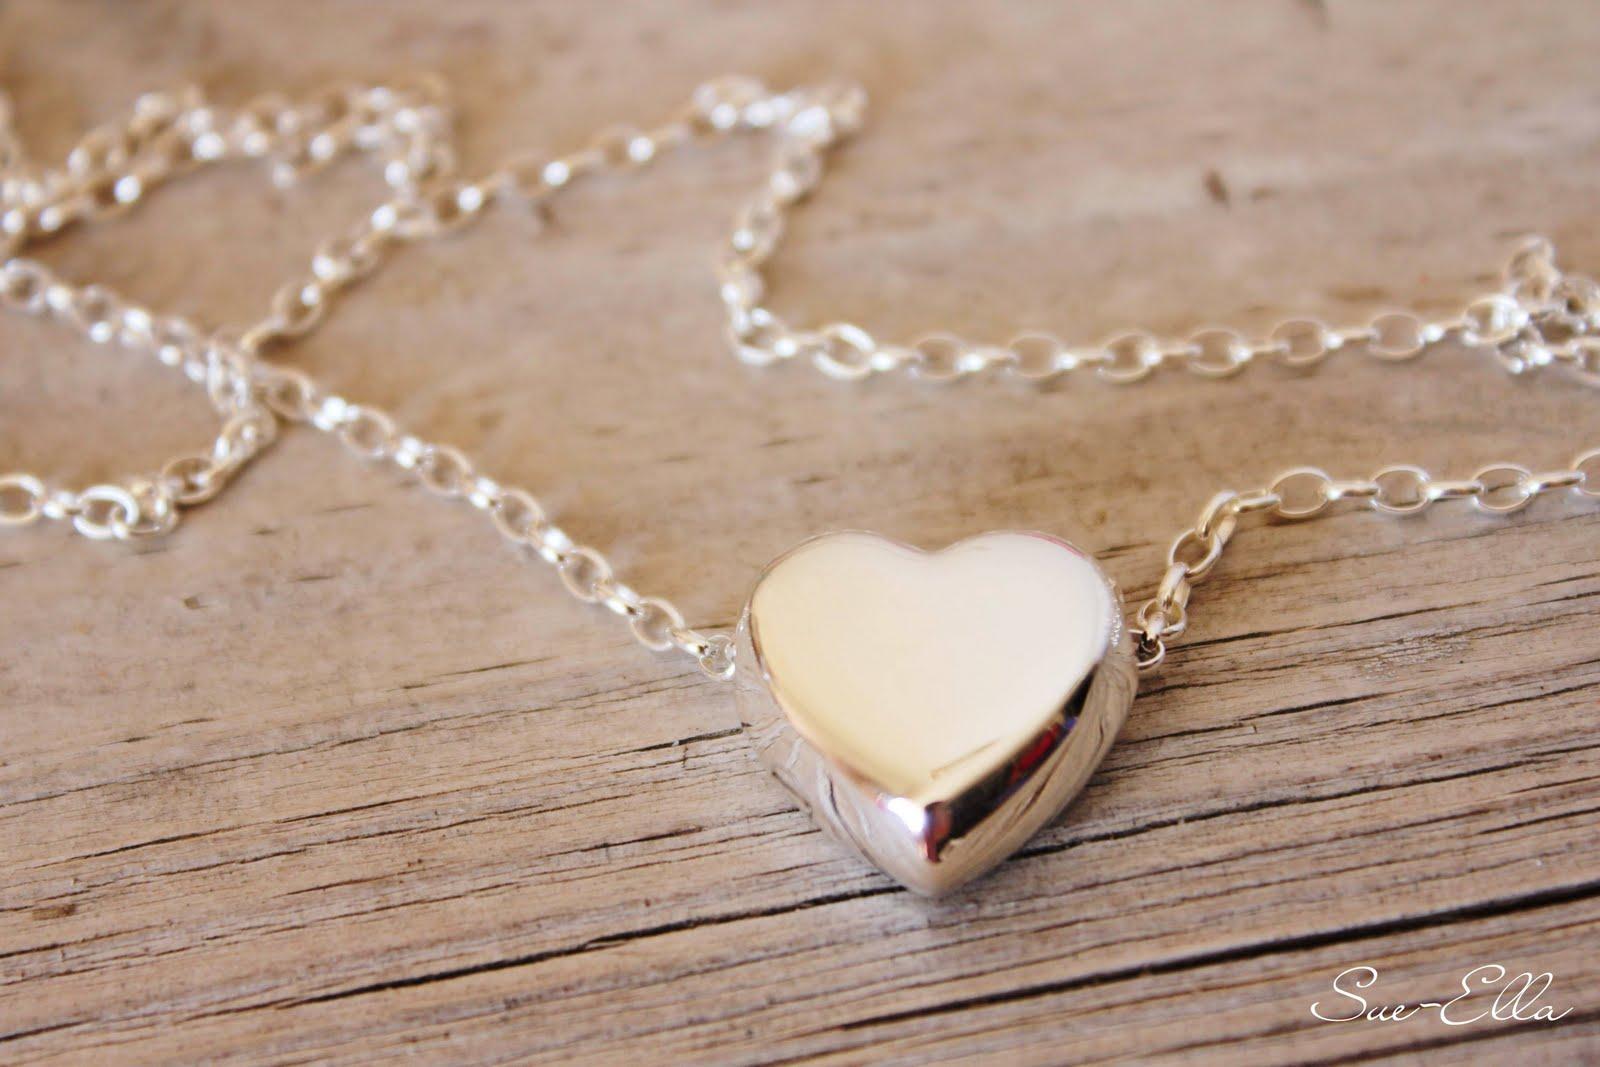 Sue Ella Signature Designs Memorial Jewellery To Hold